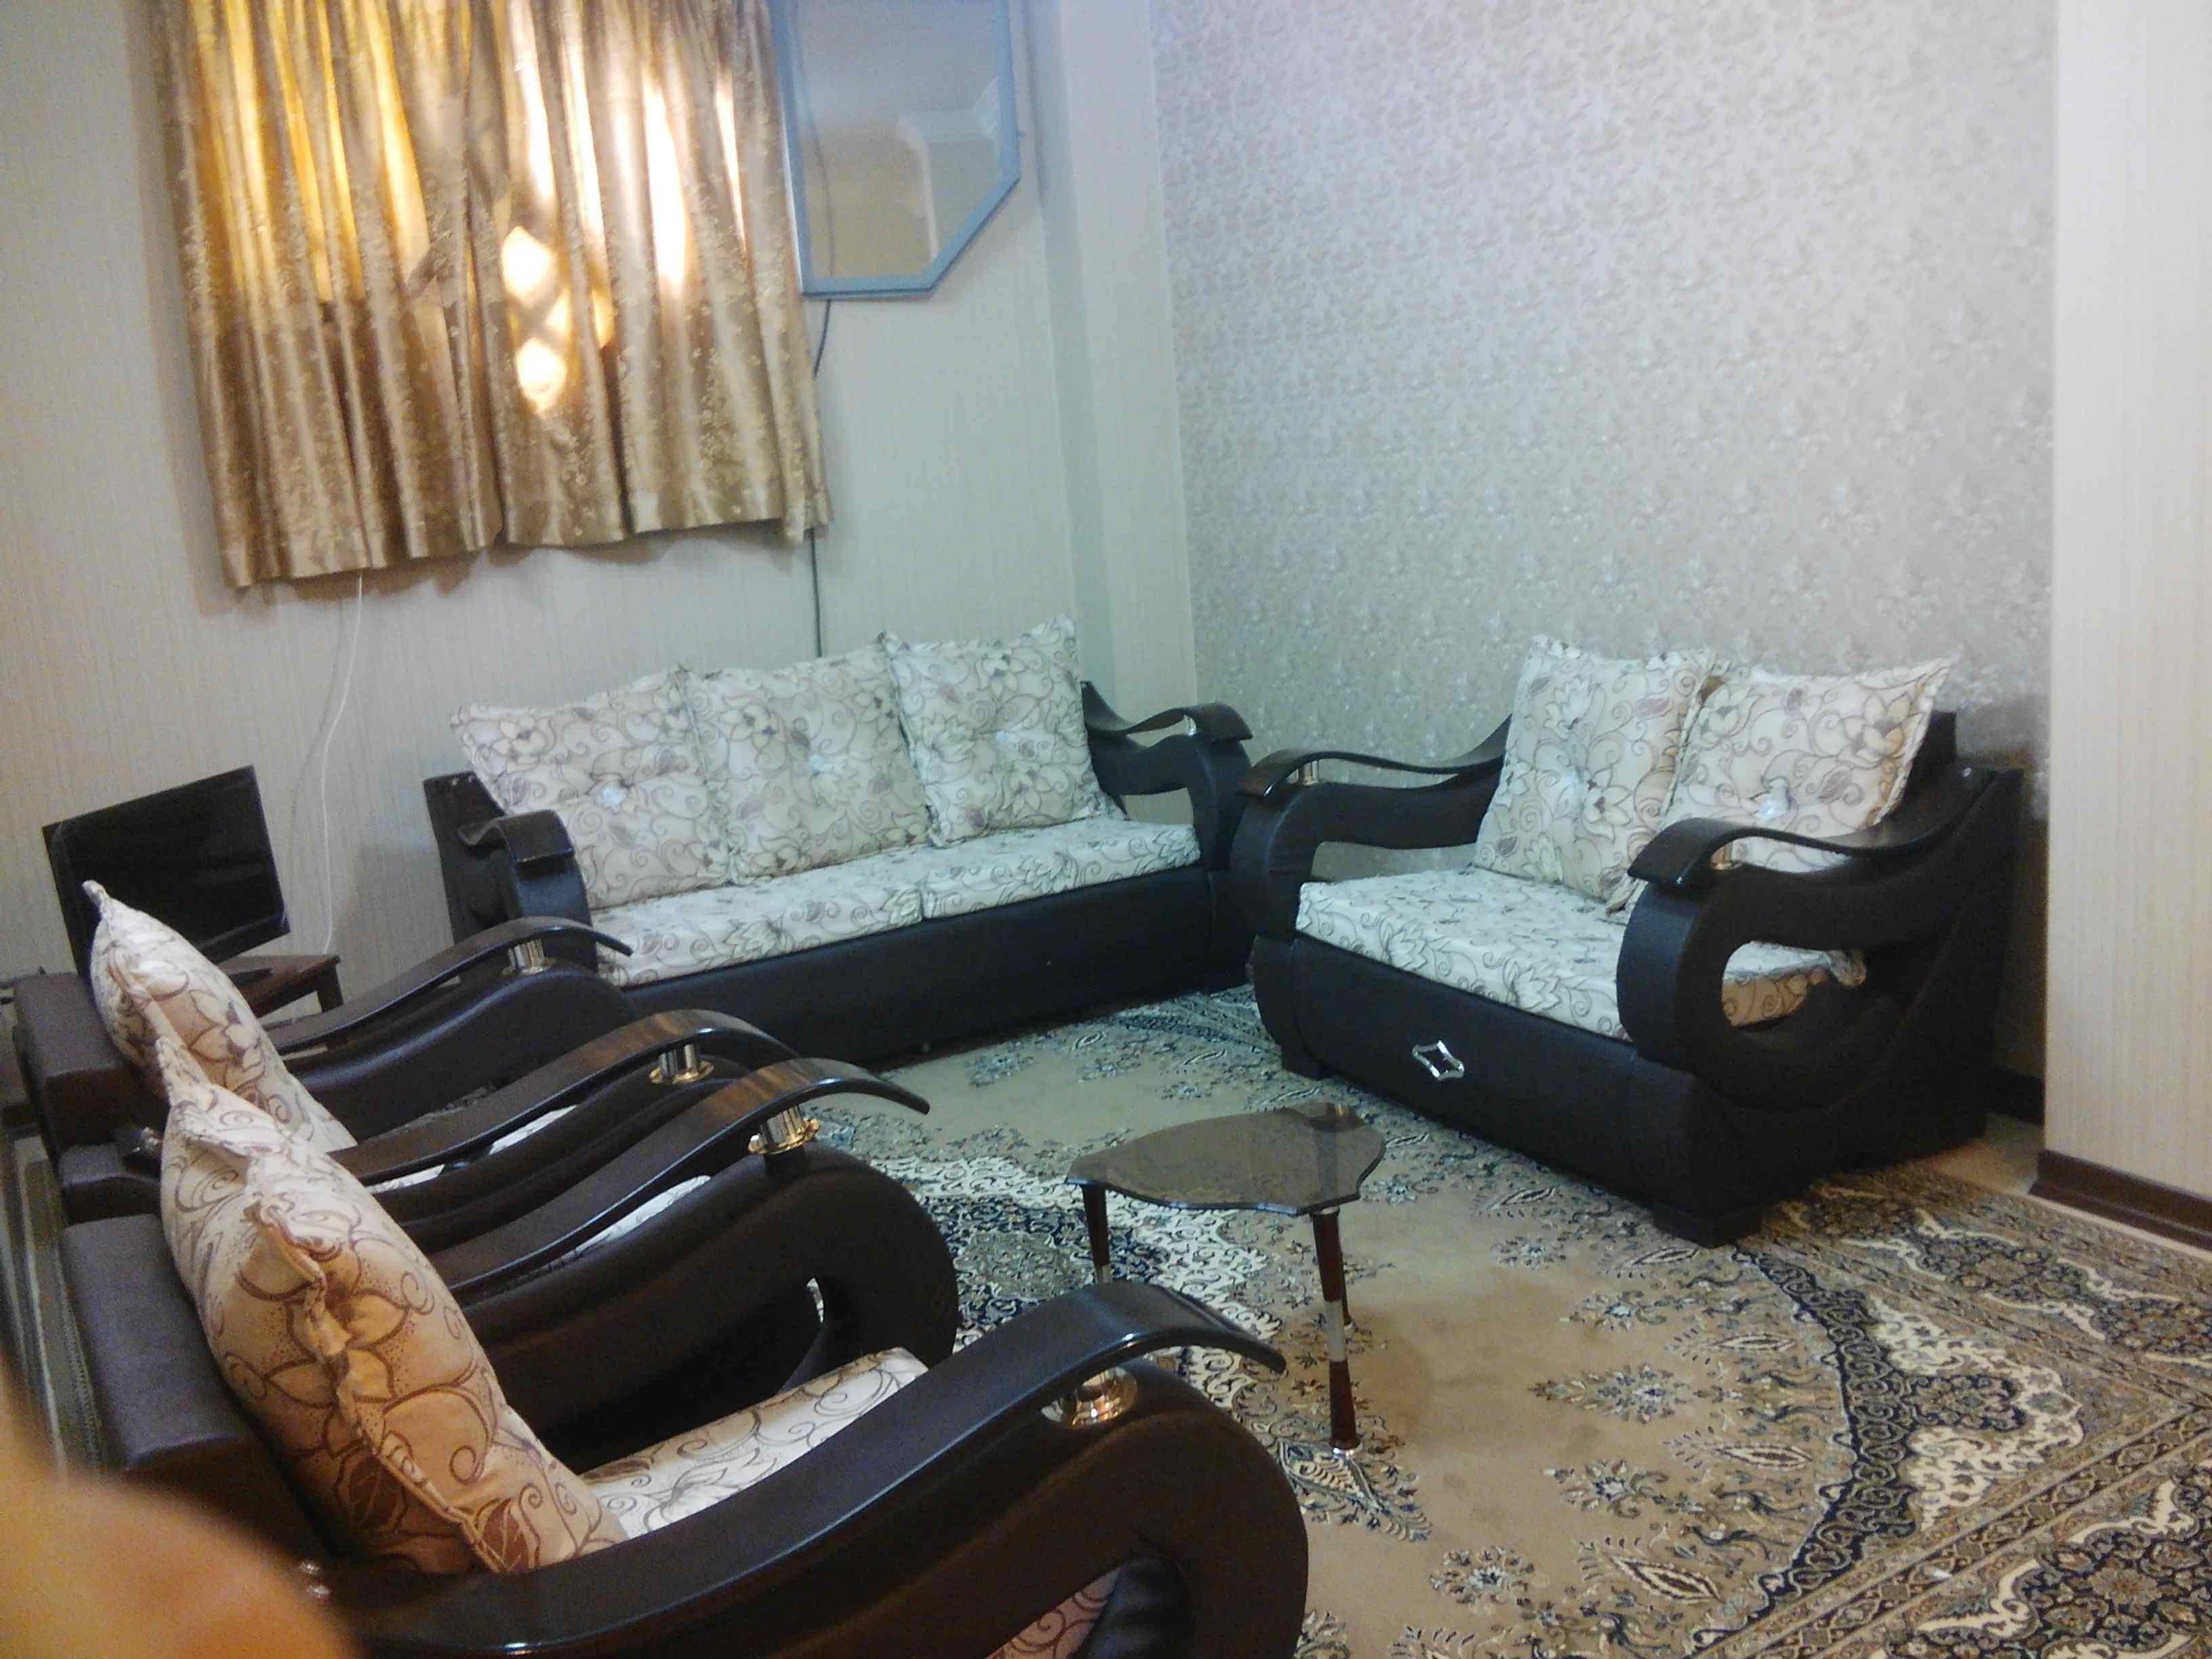 townee سوئیت اجاره ای در سروش اصفهان